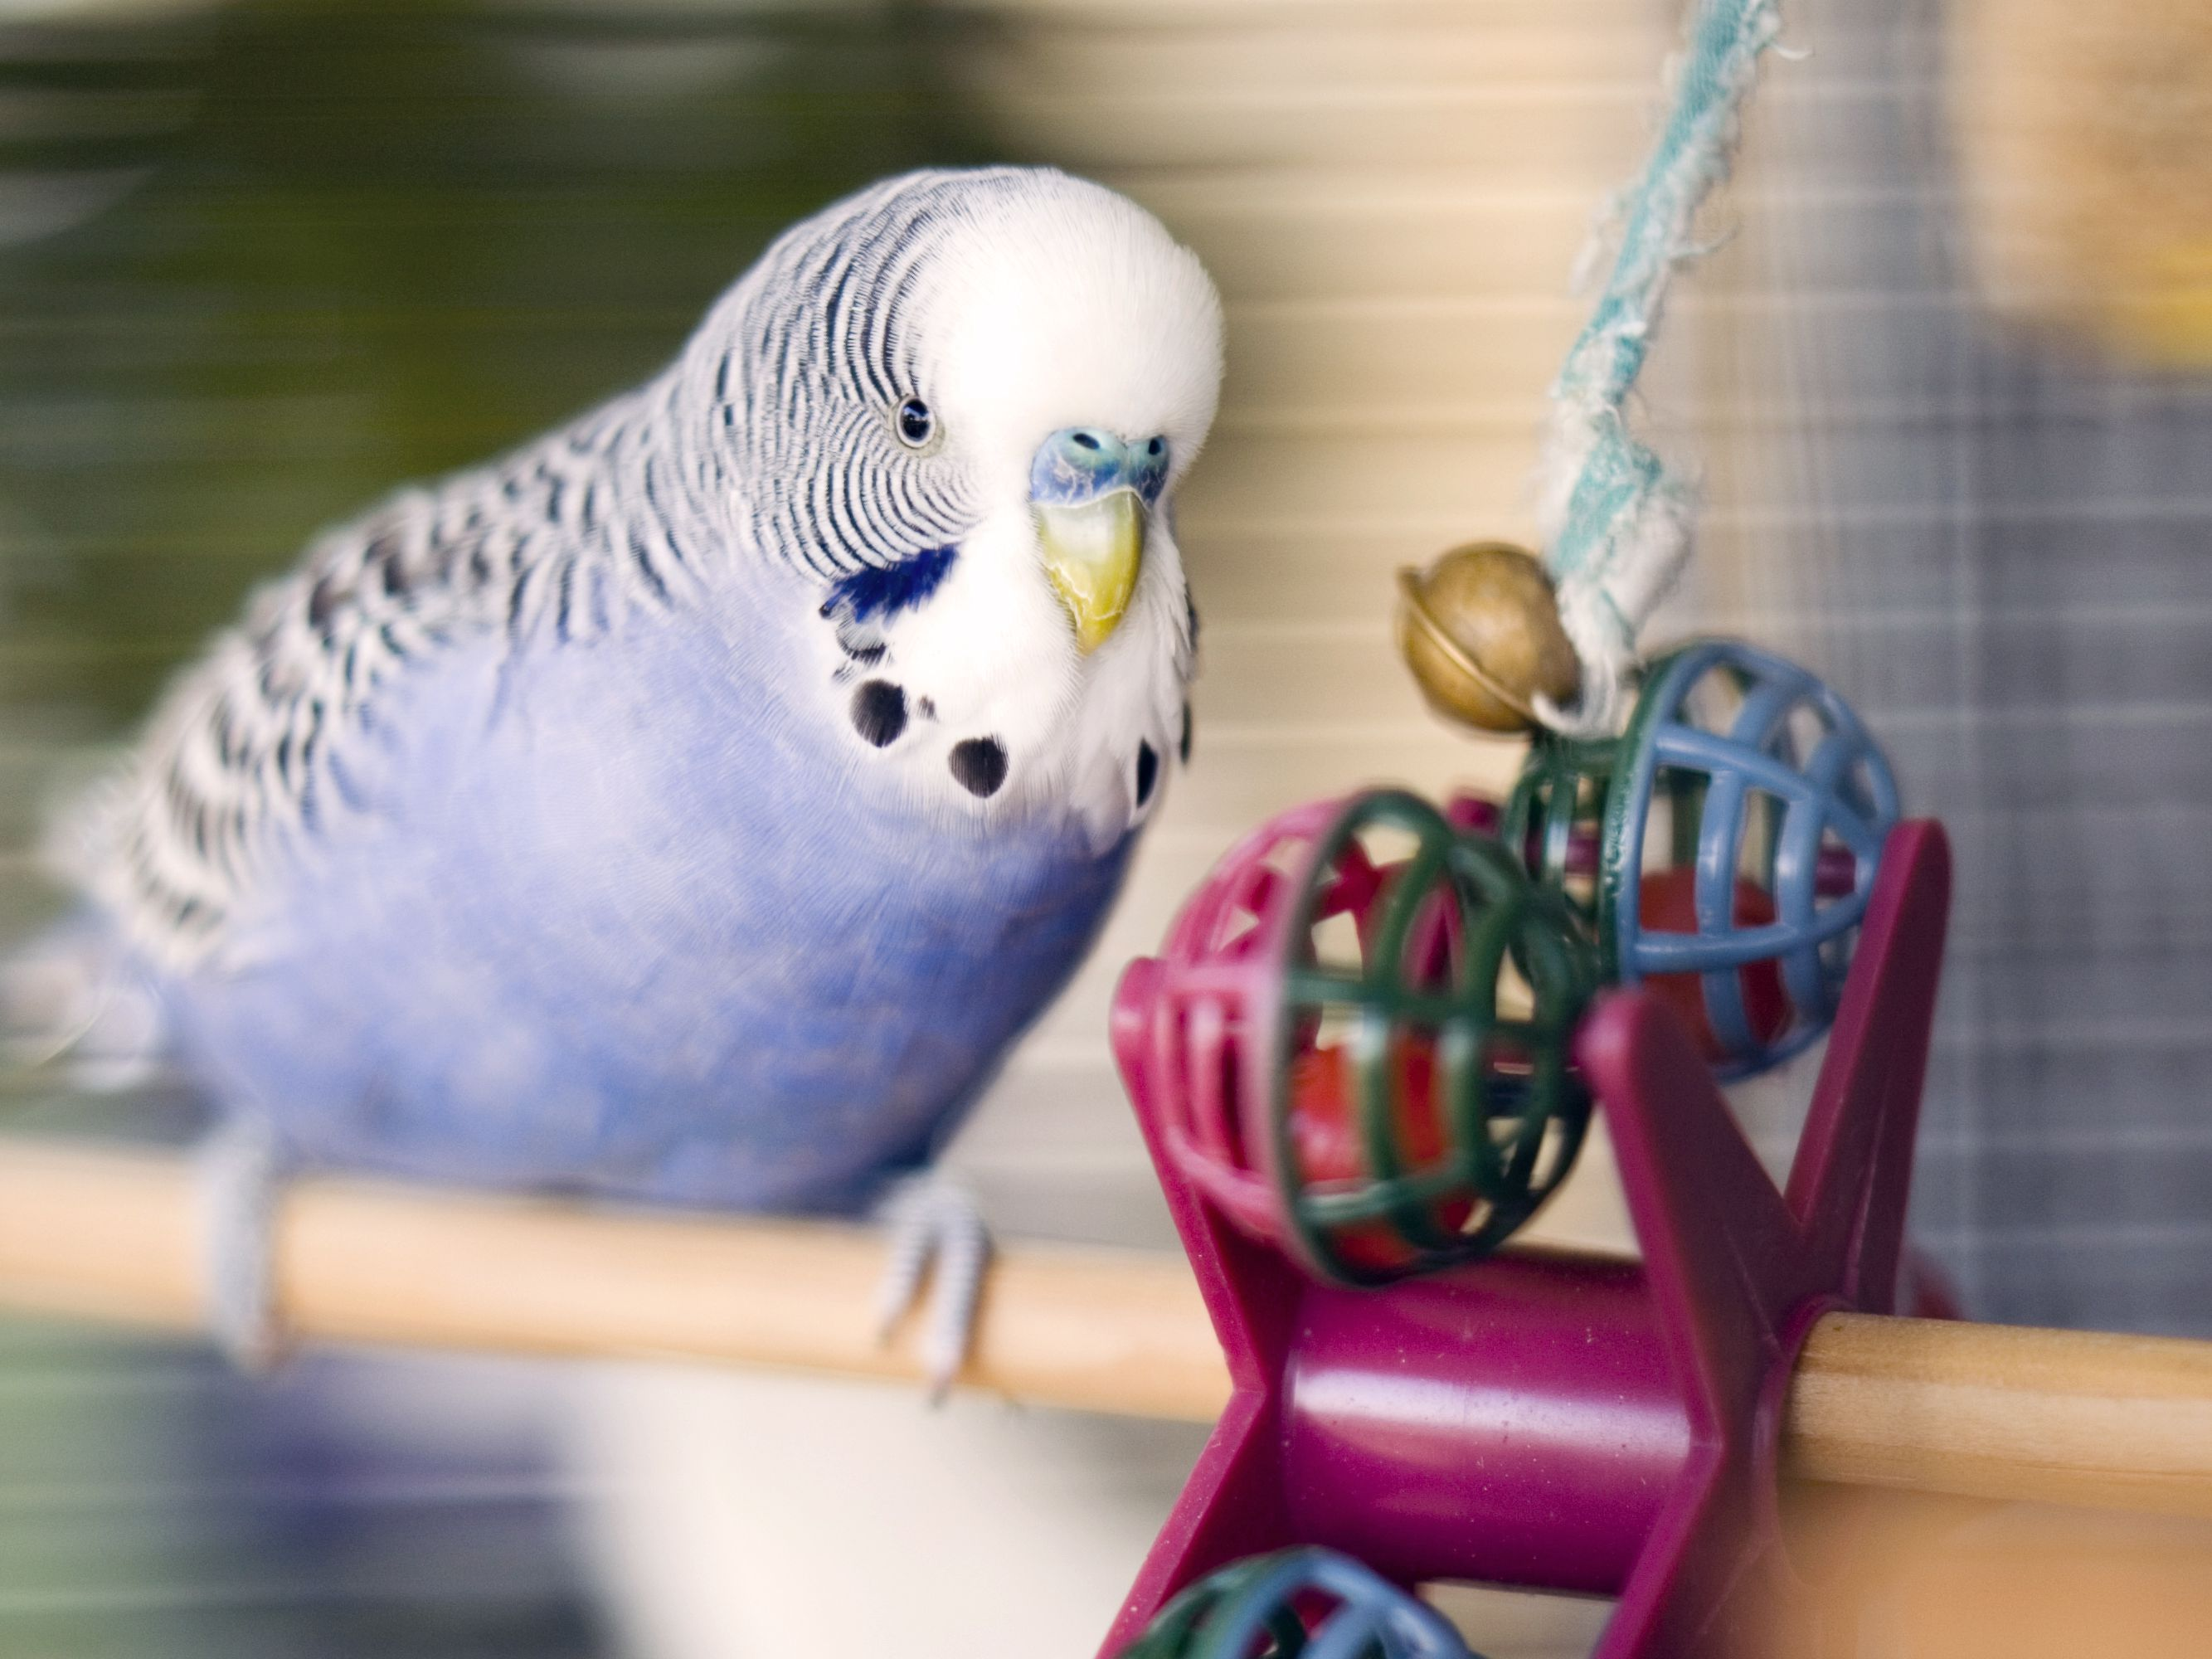 8 Top Small To Medium Pet Birds That Can Talk